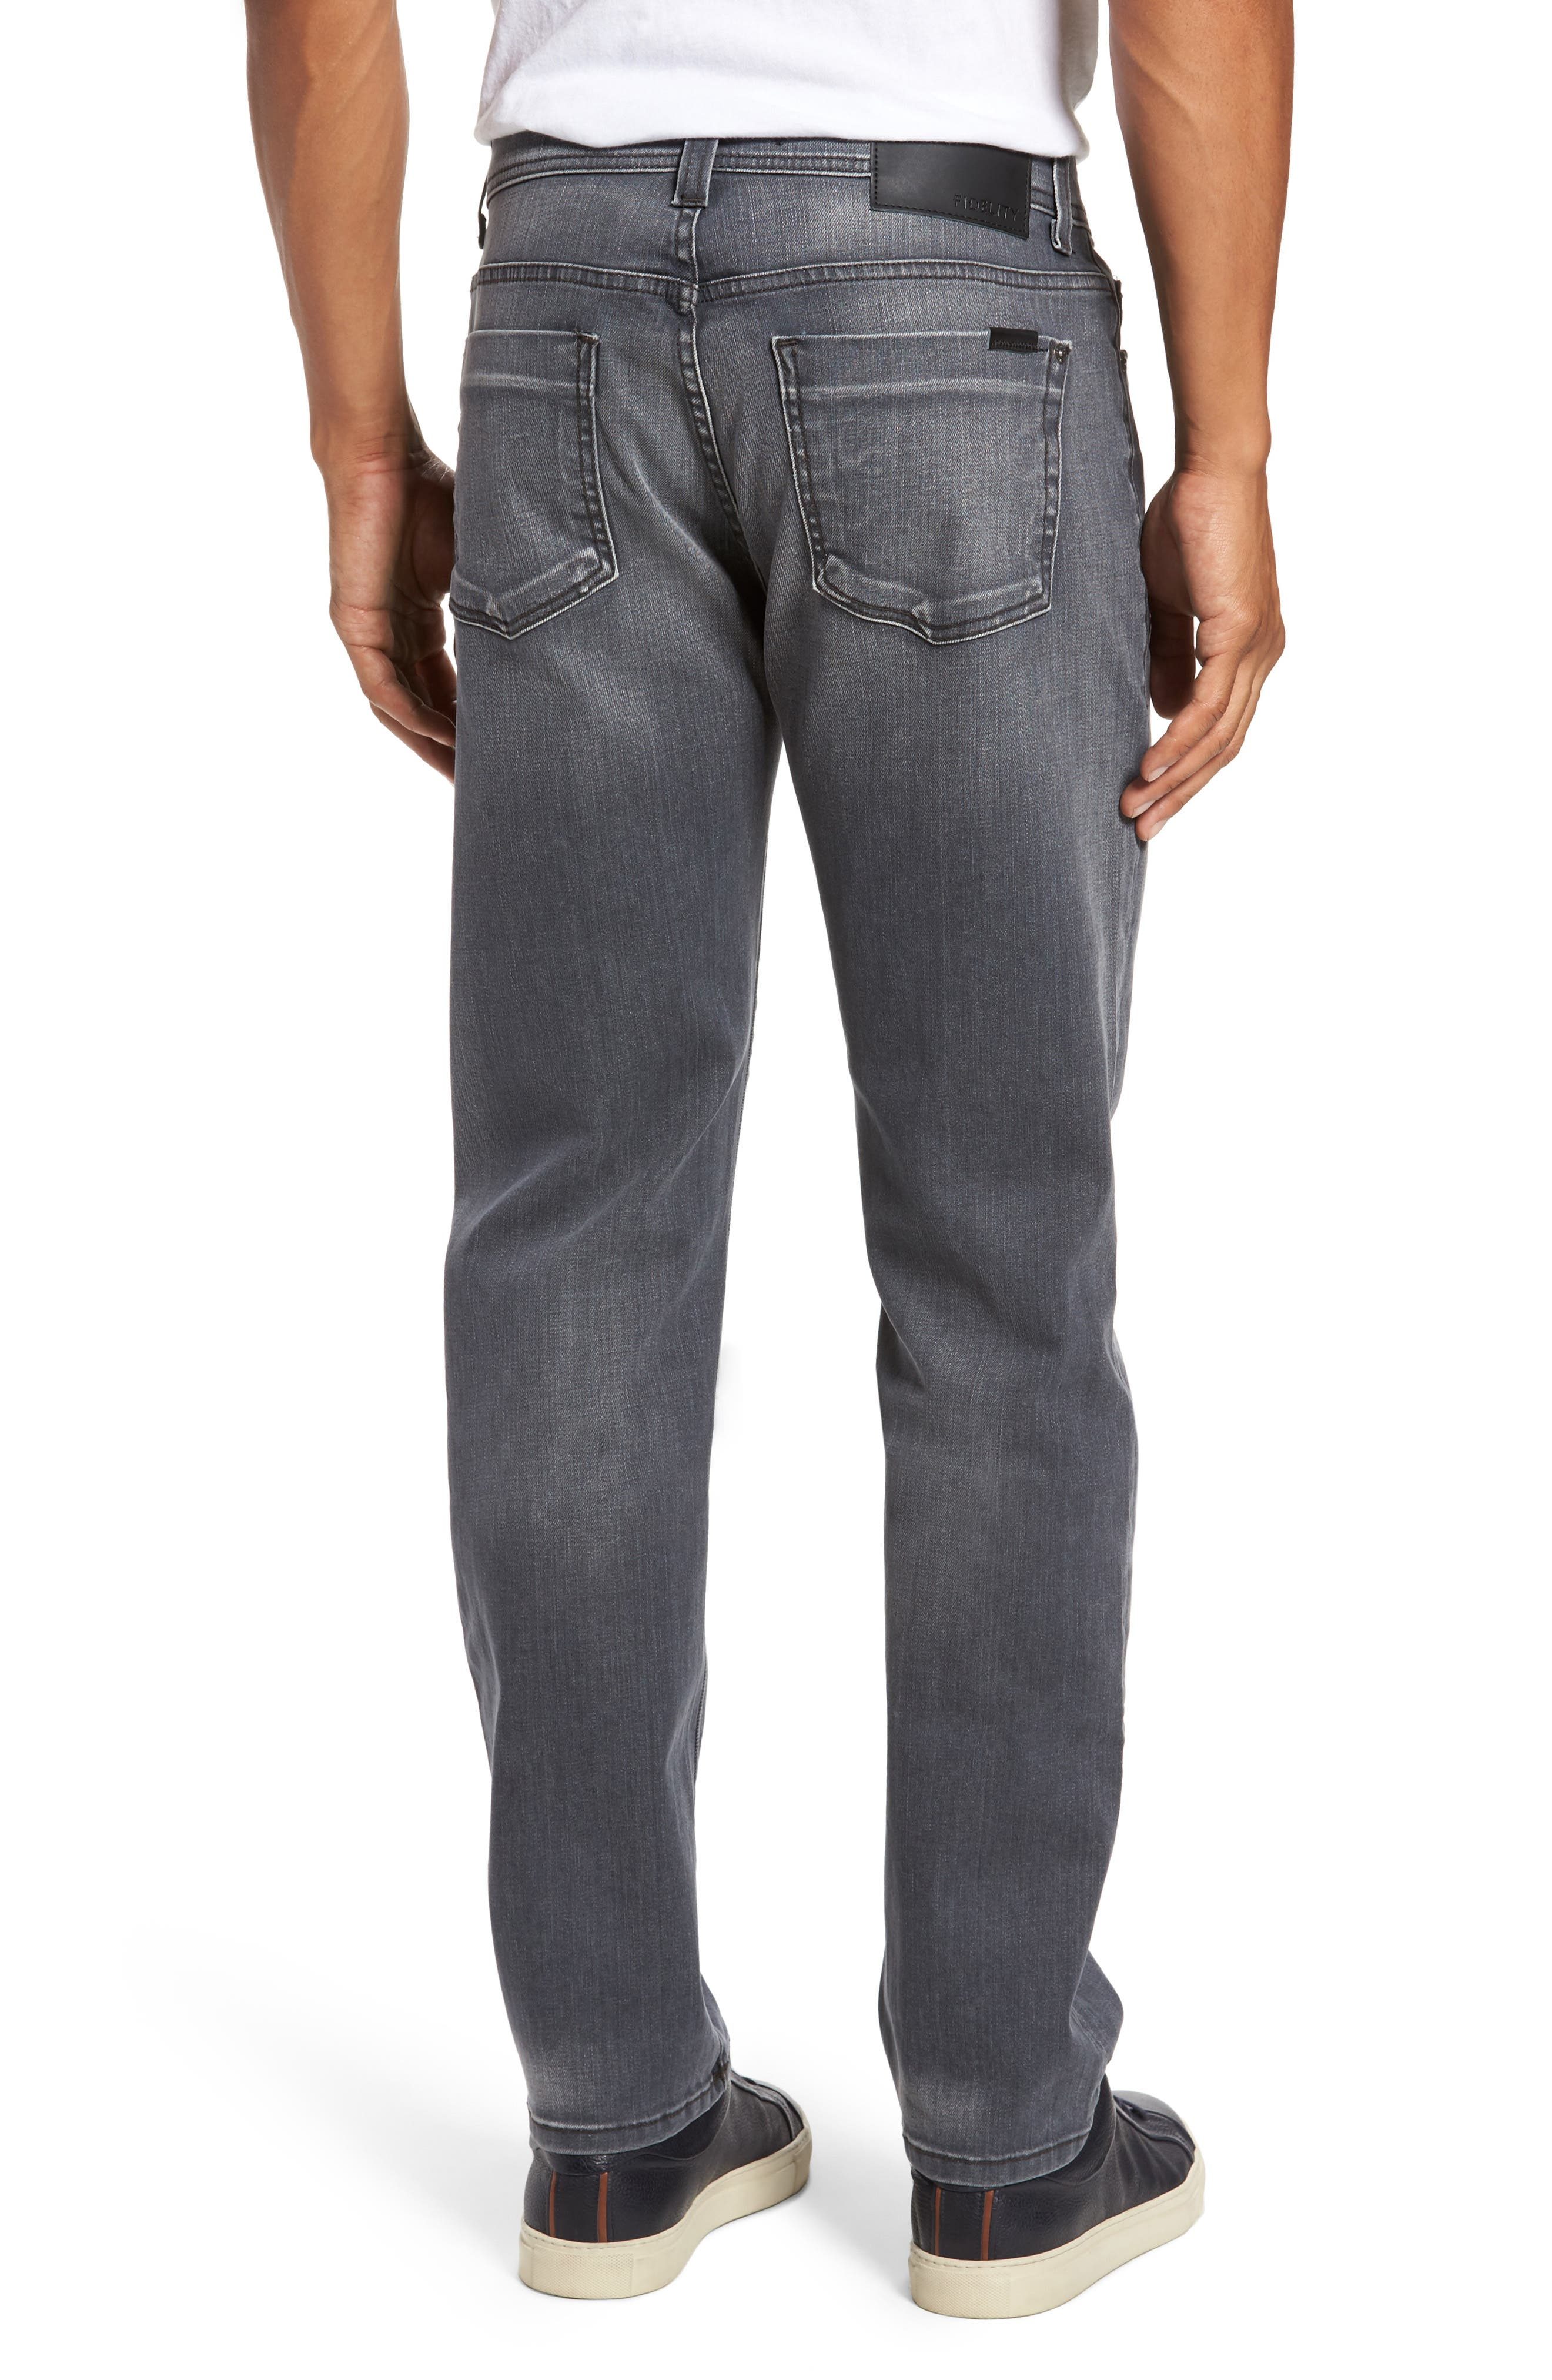 Jimmy Slim Straight Fit Jeans,                             Alternate thumbnail 2, color,                             Steelo Vintage